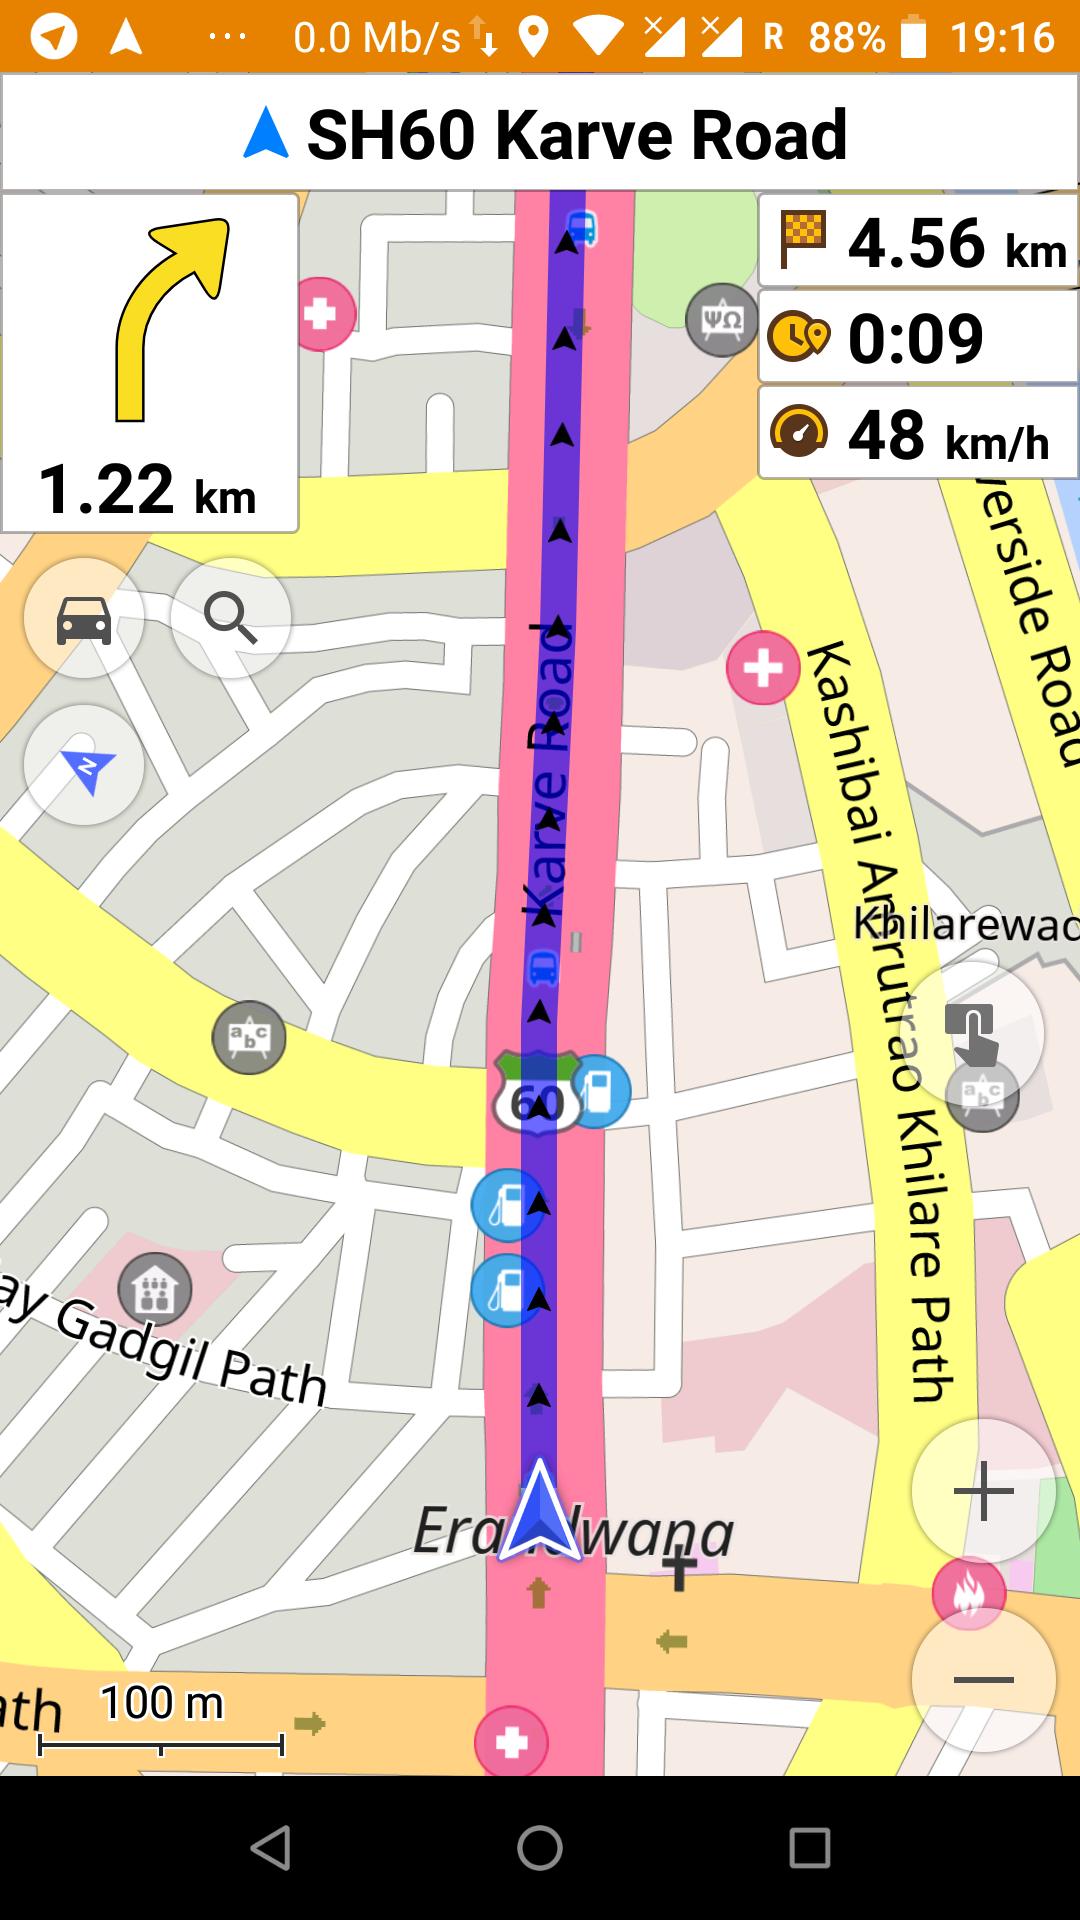 1160 (osd lane guidance) – Navit